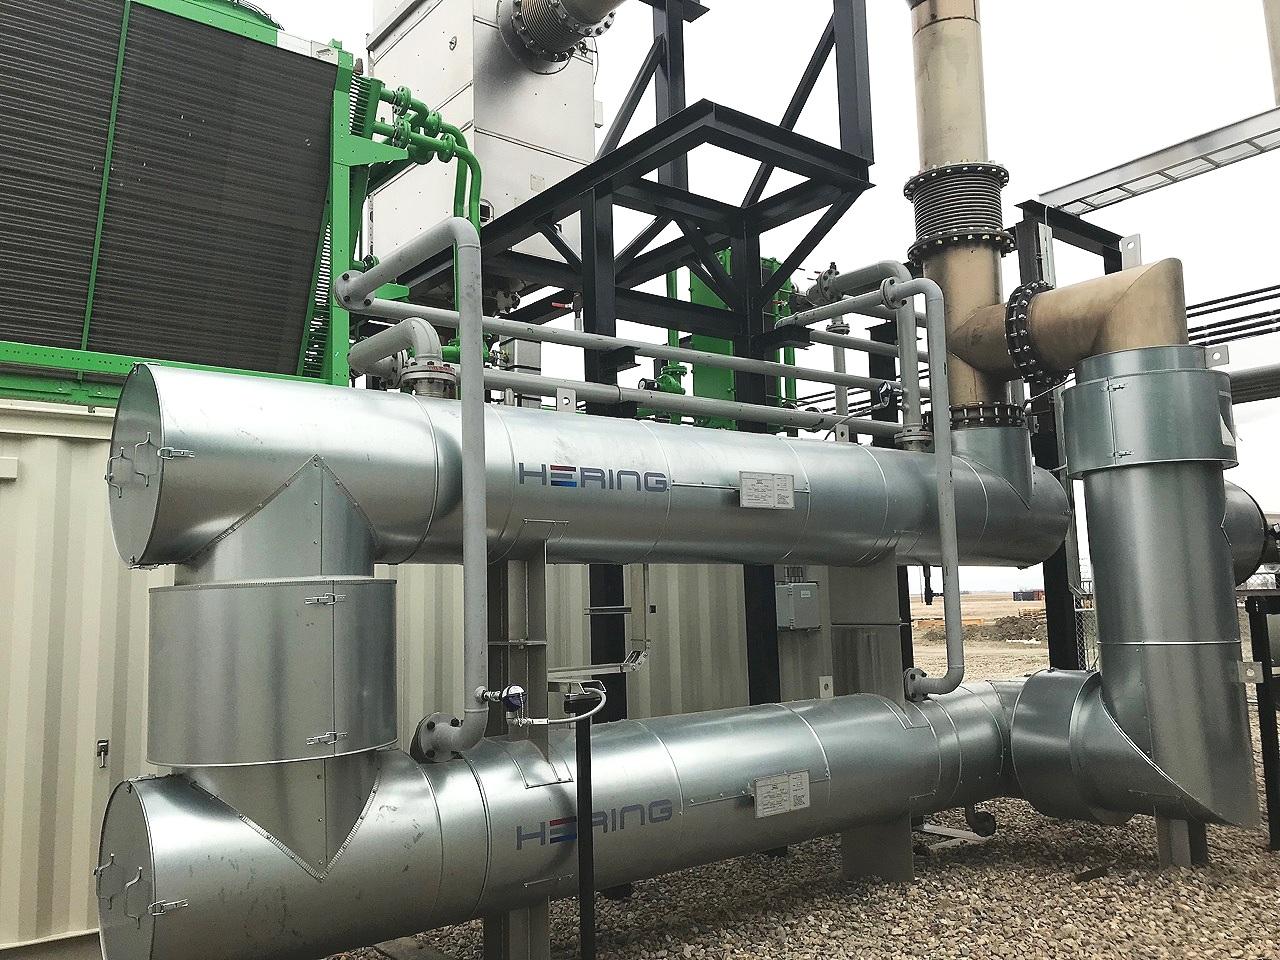 2019-04-09+Unit+2+exhaust+gas+heat+exchanger.jpg